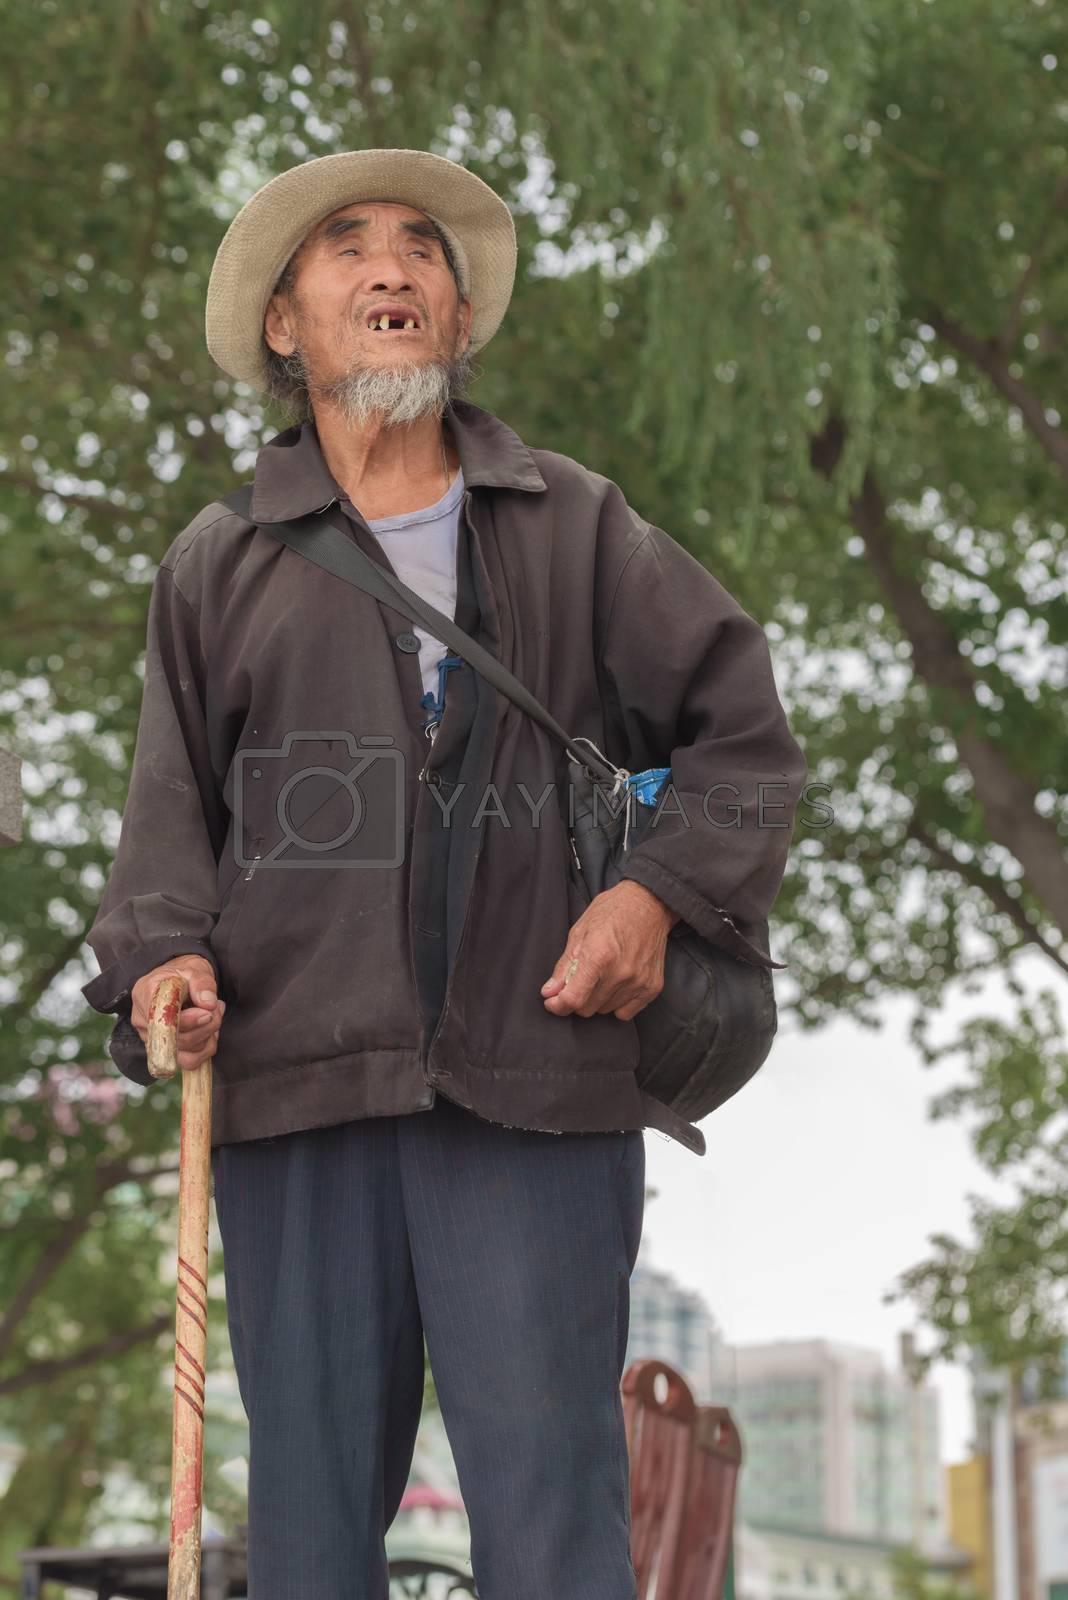 Harbin, Heilongjiang, China - September 2018: Asian old man with a cane